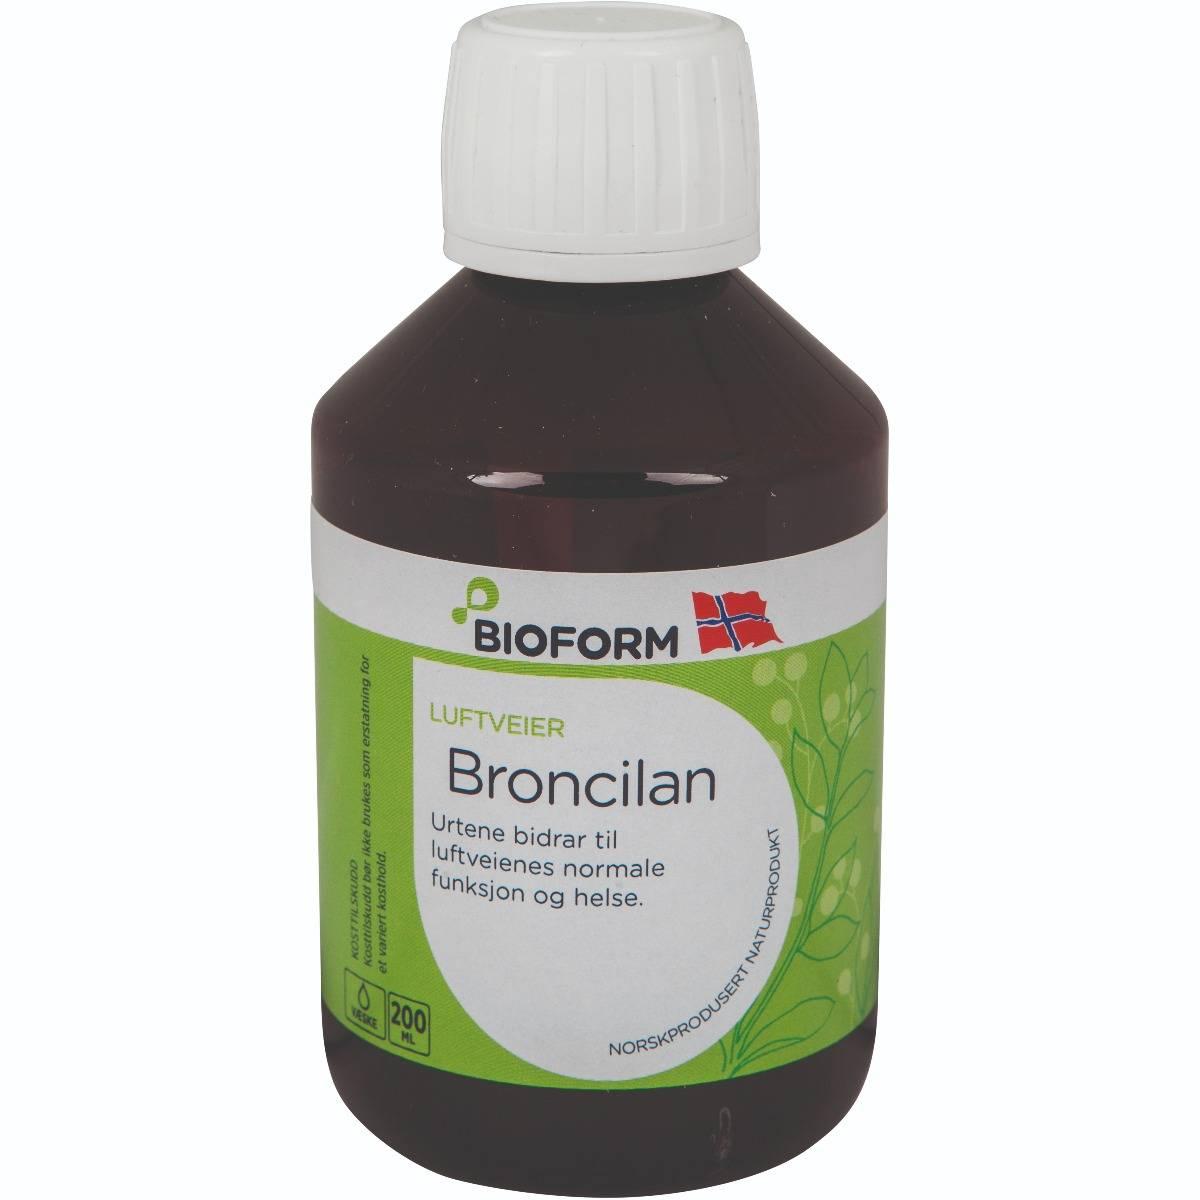 Bioform® Broncilan 200 ml